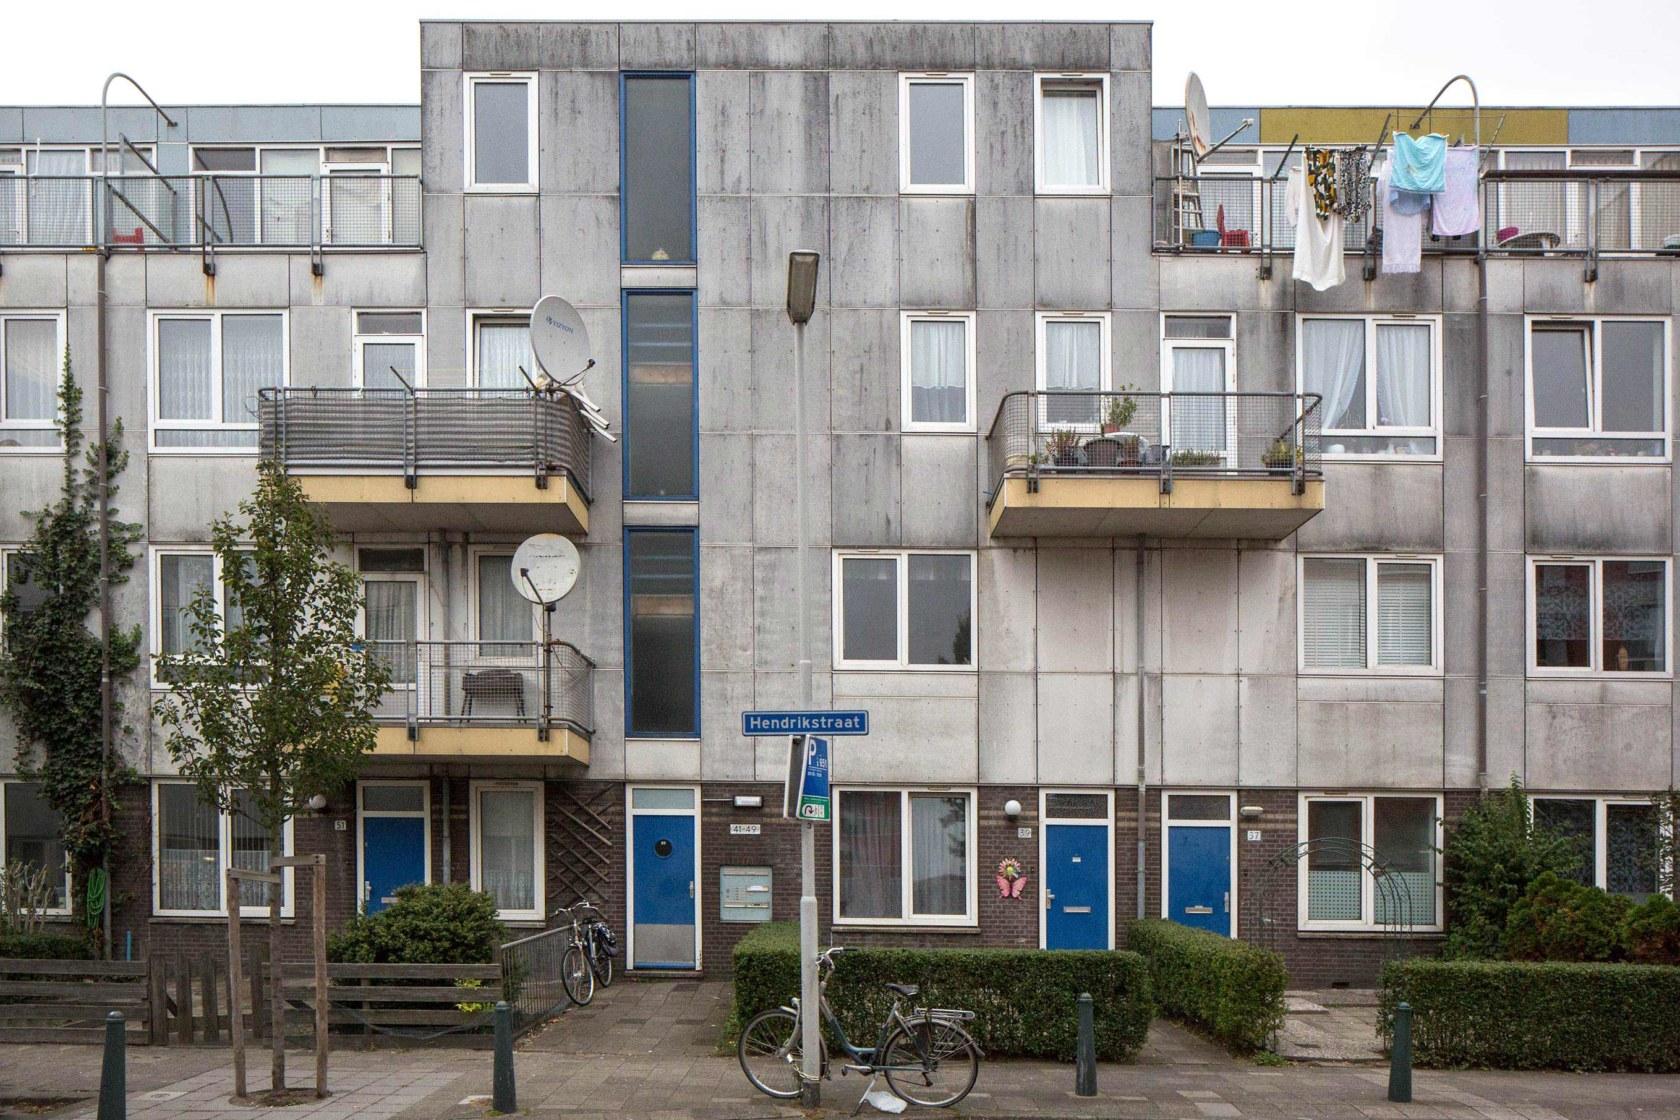 crooswijk-16